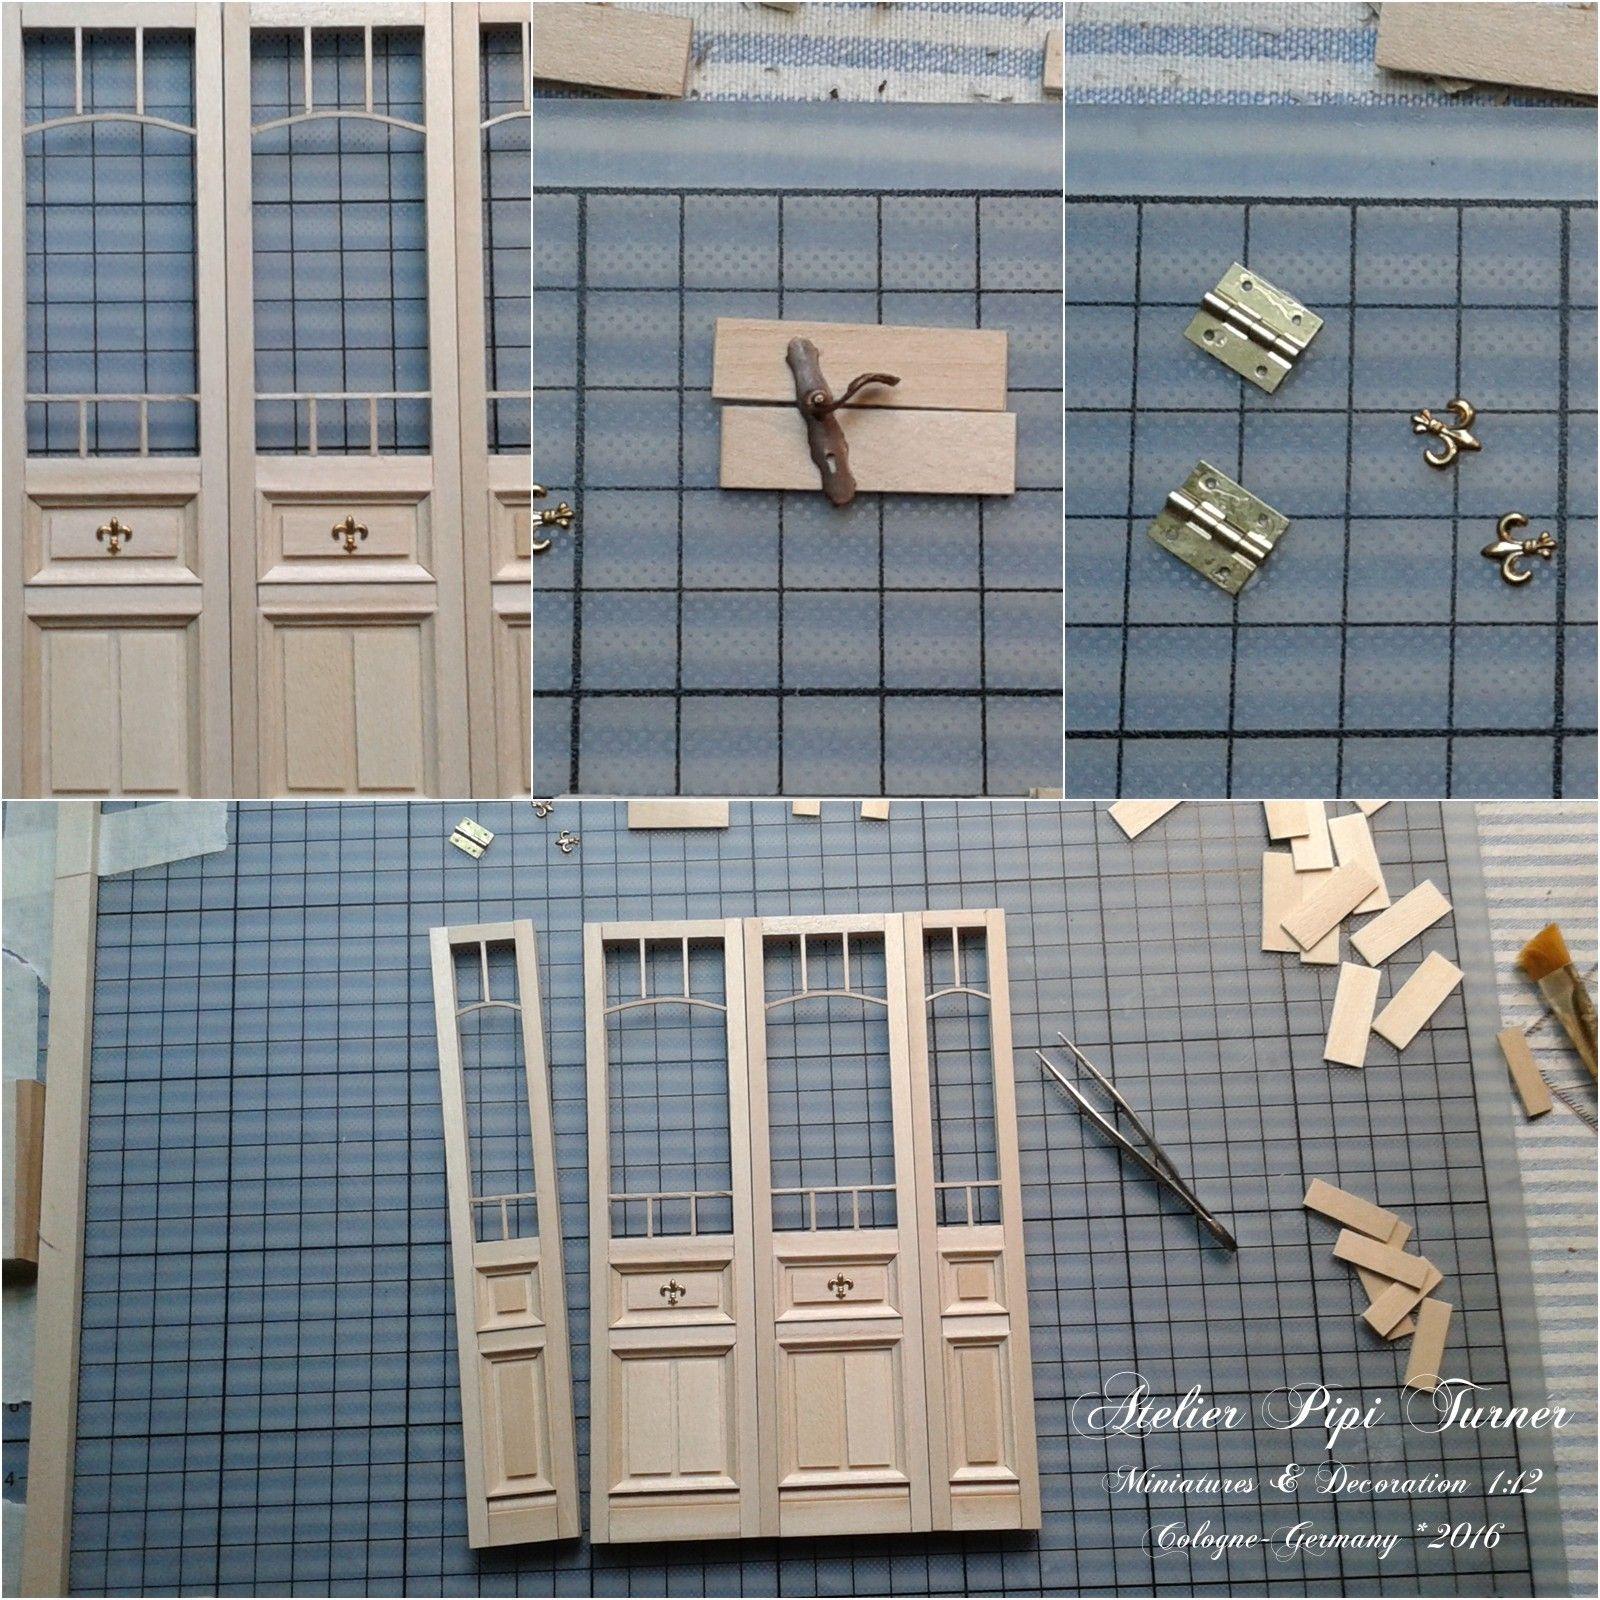 pipi turner miniatures working door nasil yapilir pinterest t ren miniatur und modellbau. Black Bedroom Furniture Sets. Home Design Ideas